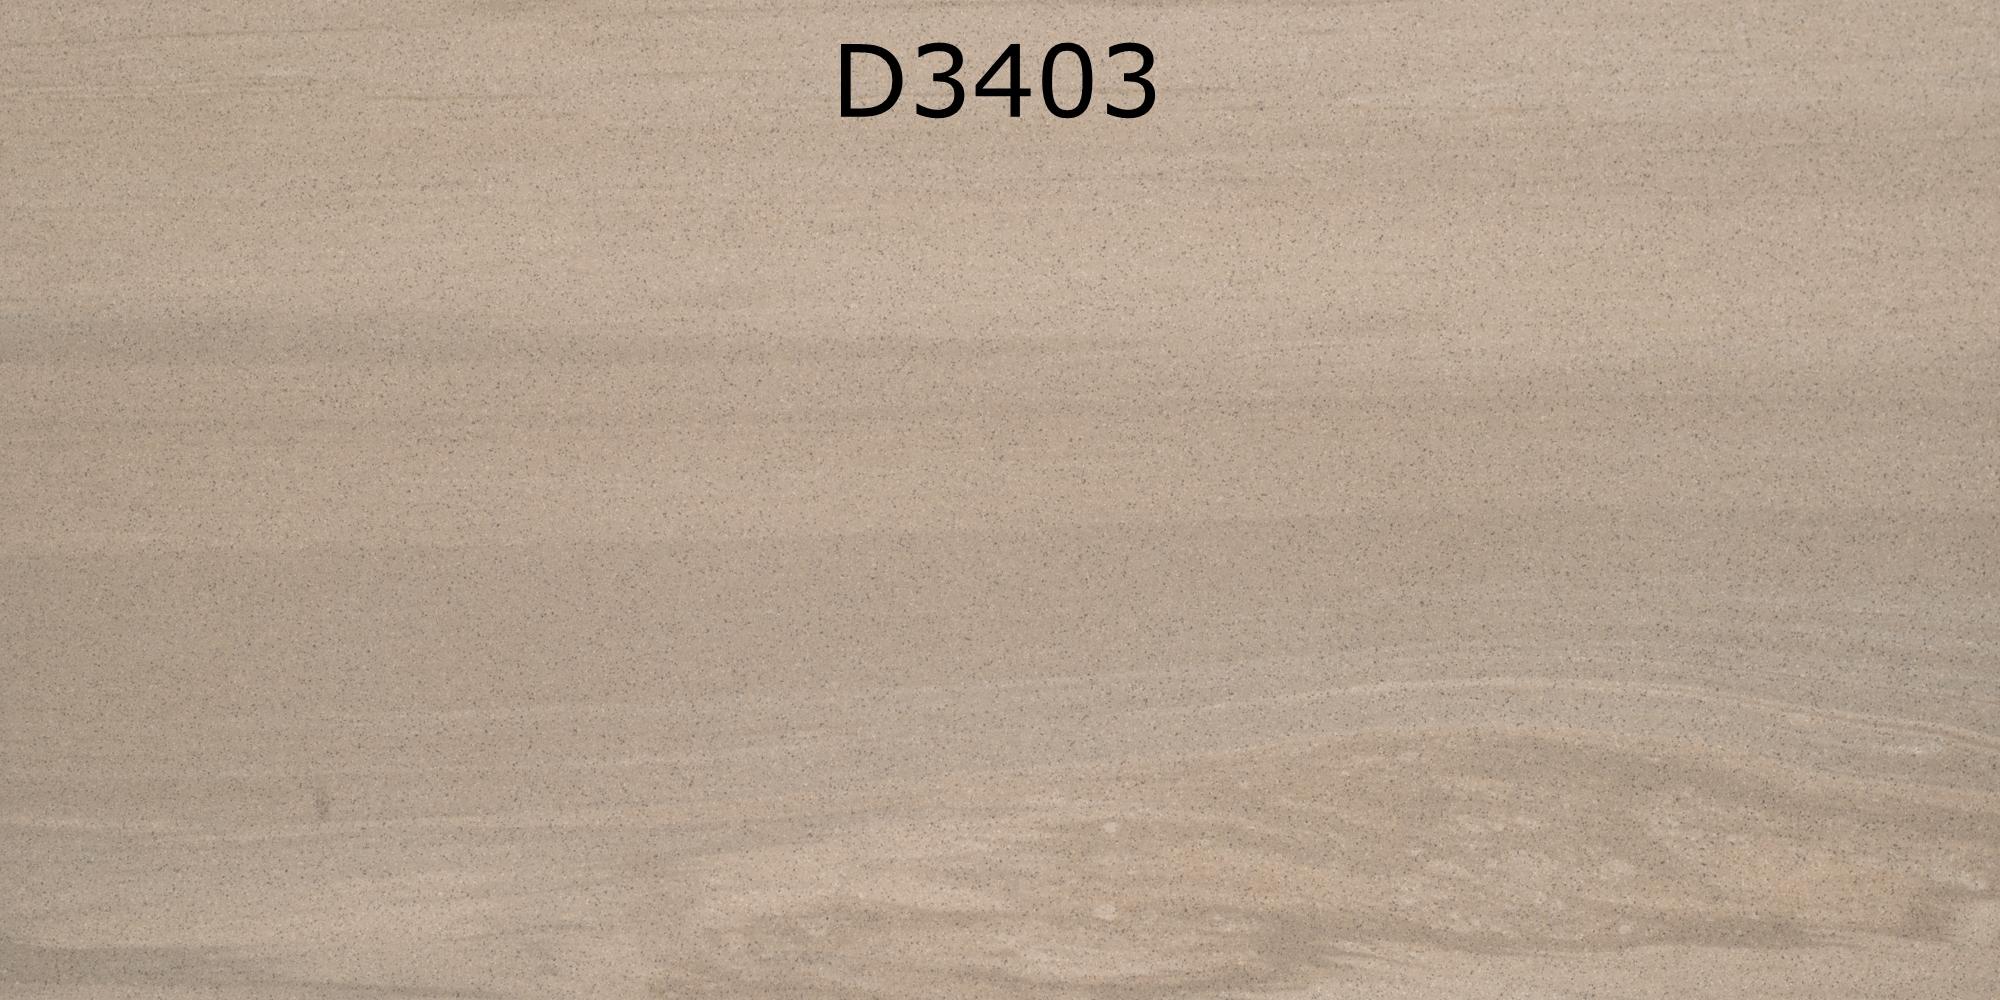 D3403